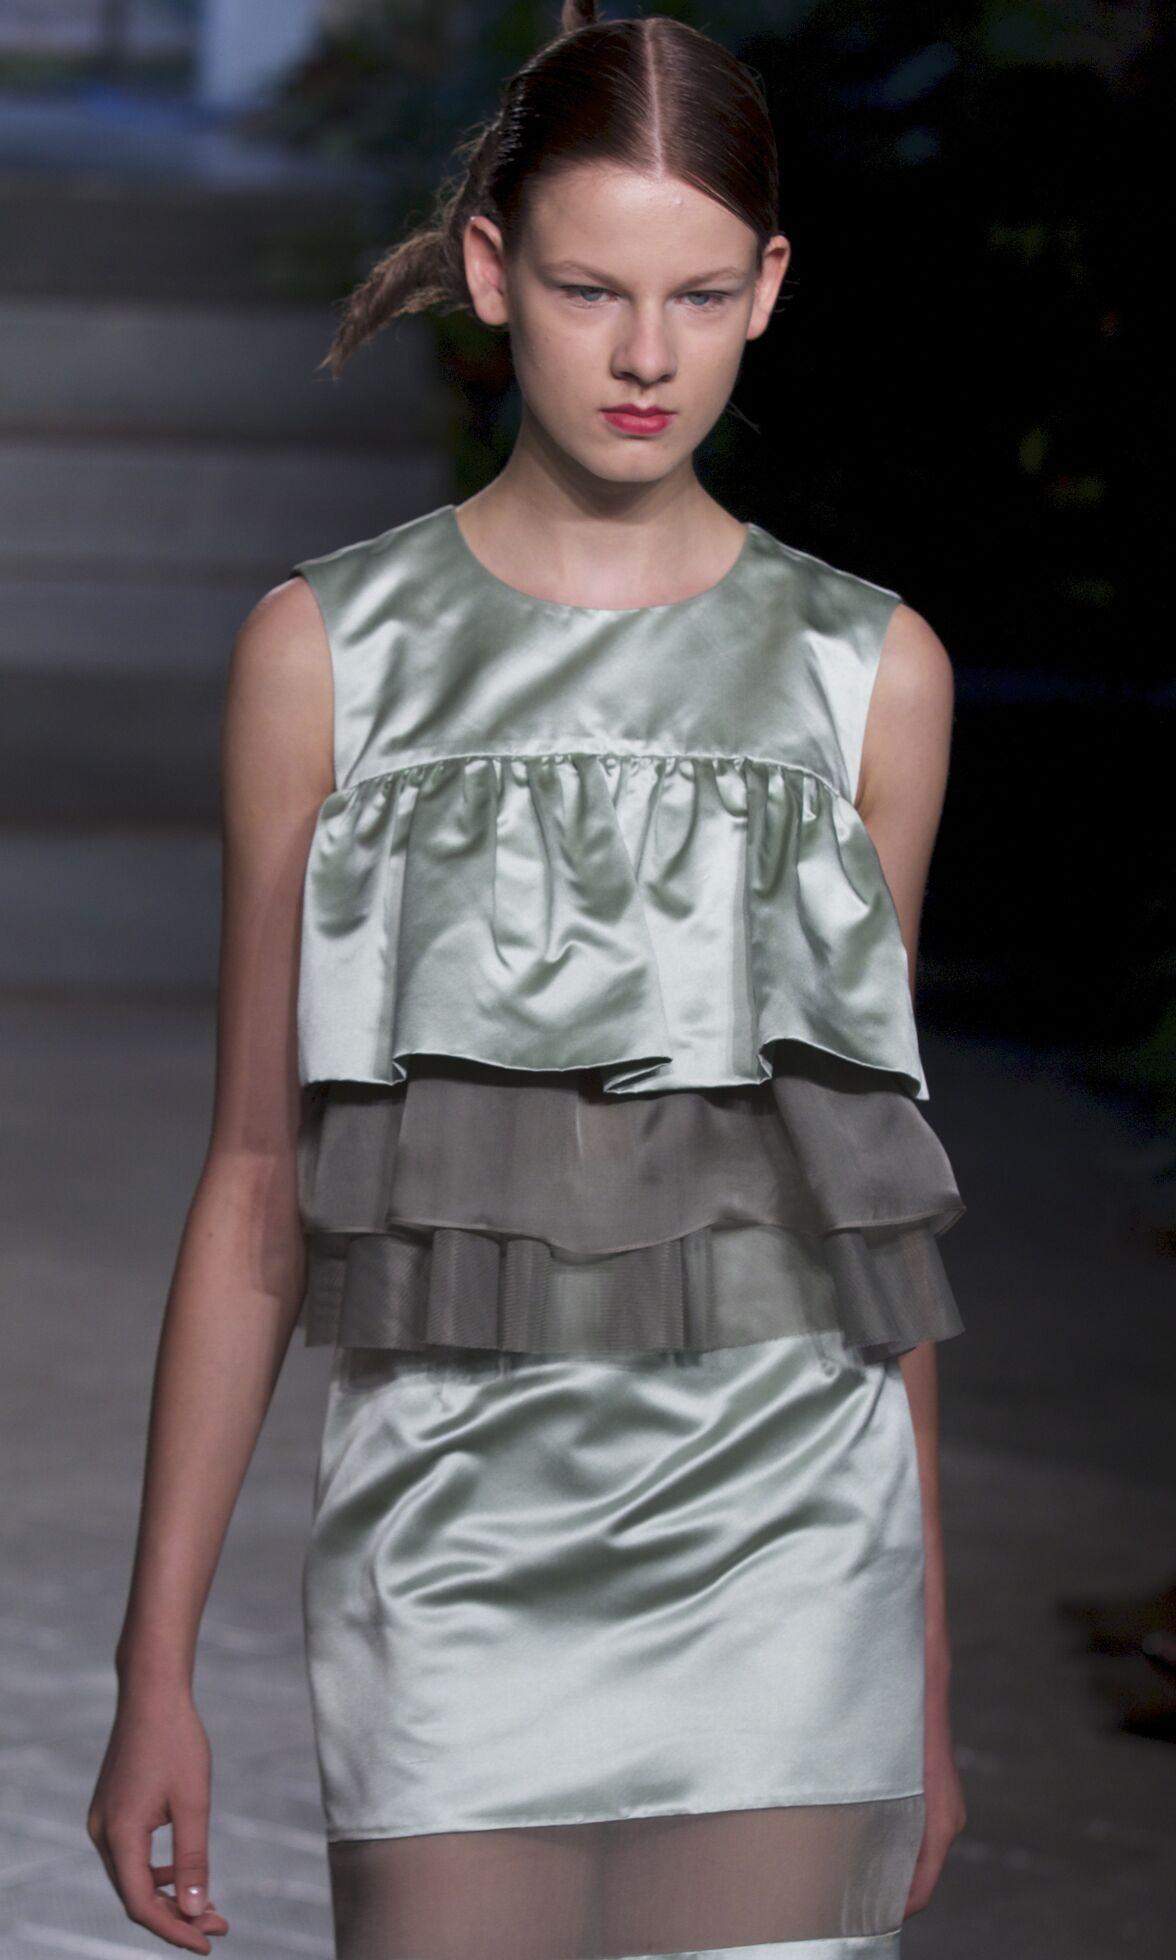 Spring 2014 Woman Fashion Show Antonio Marras